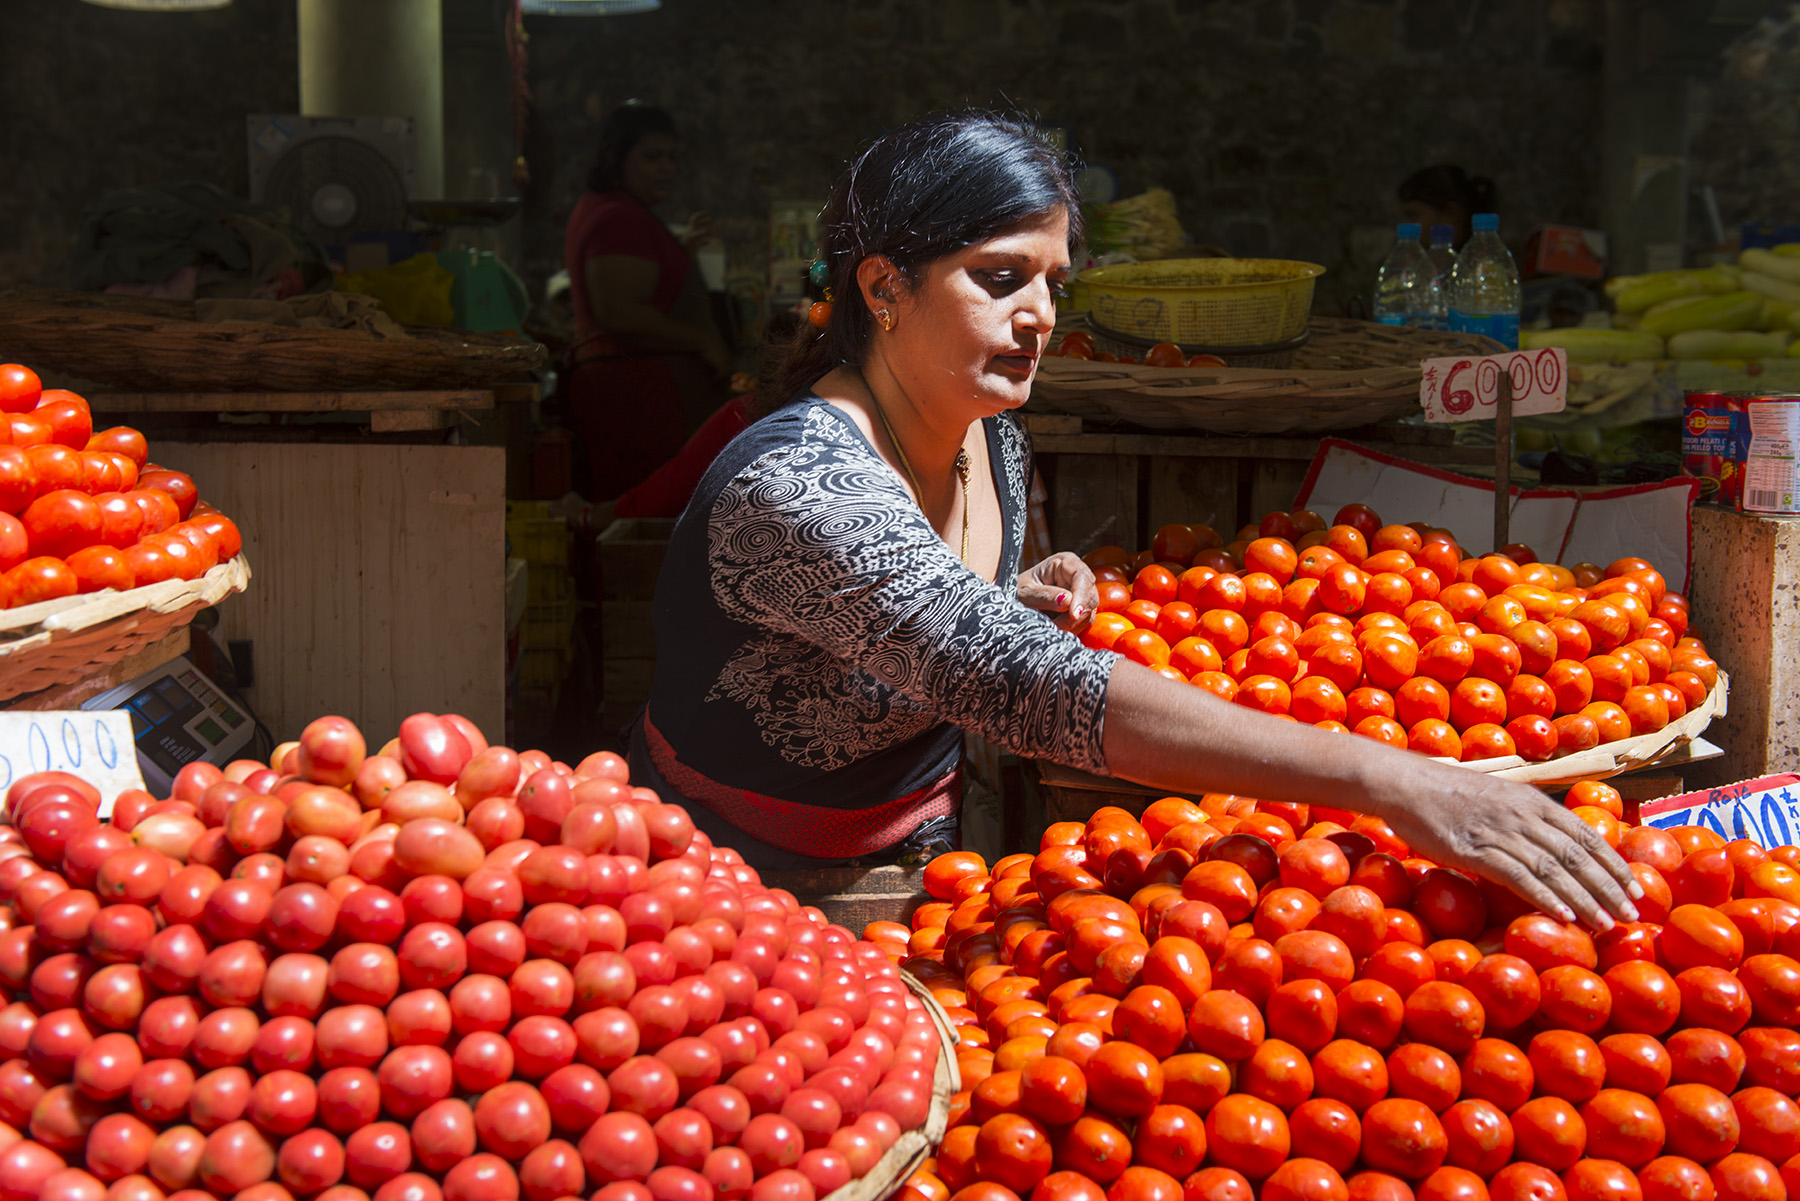 mauritius_port-louise-market_tomatos_